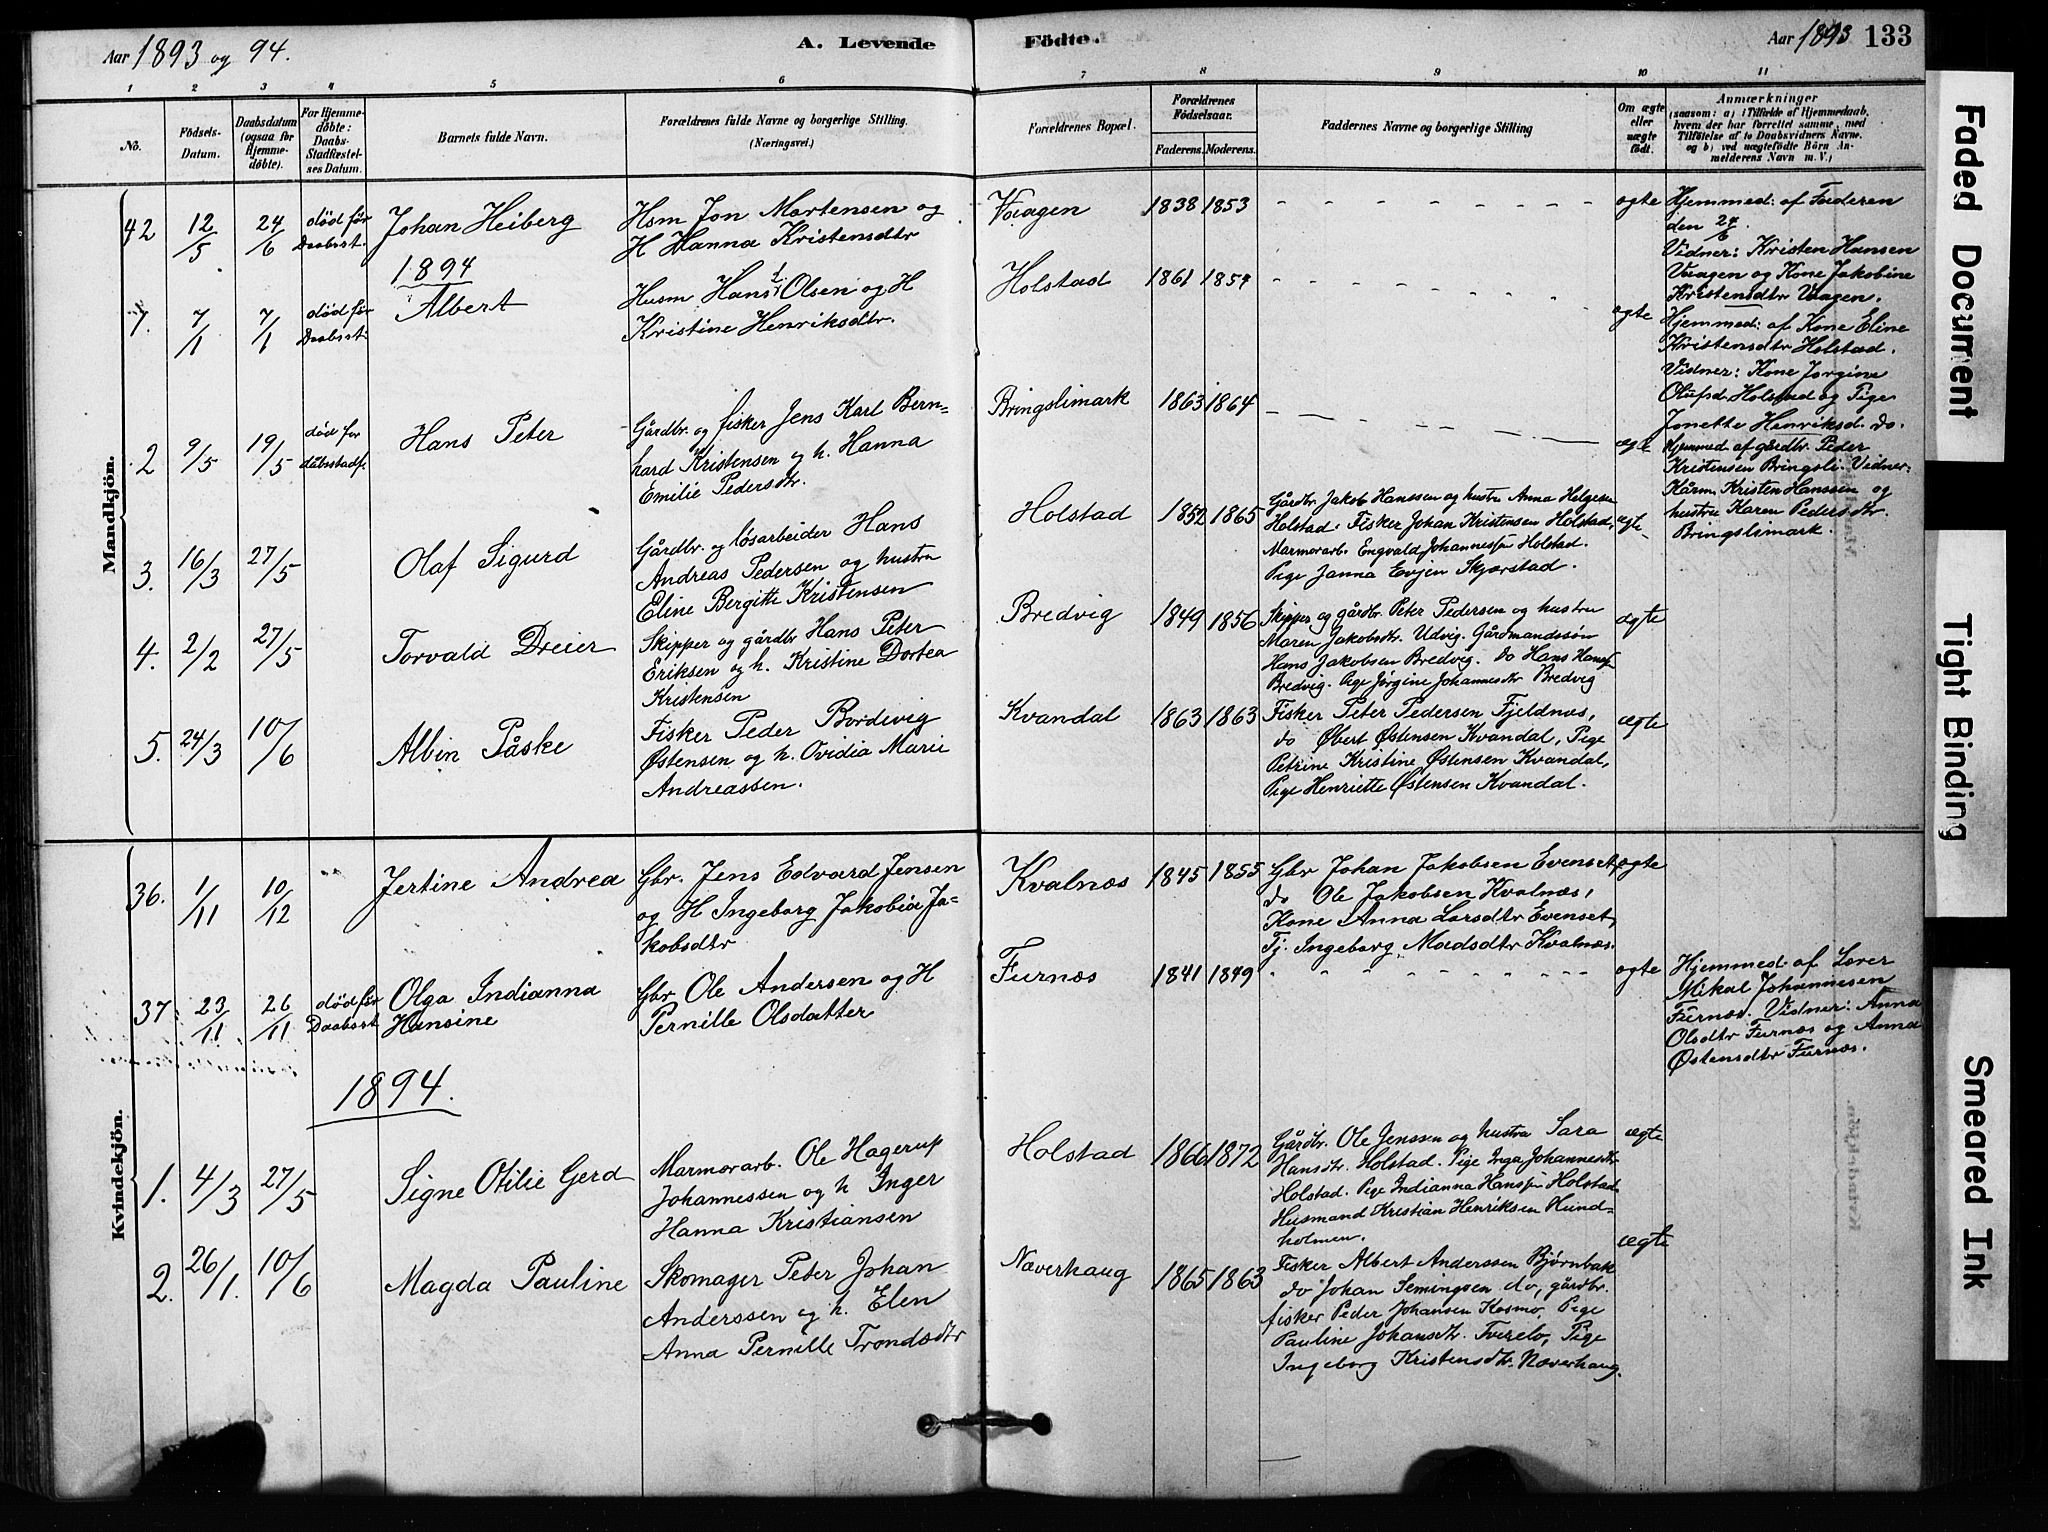 SAT, Ministerialprotokoller, klokkerbøker og fødselsregistre - Nordland, 852/L0754: Klokkerbok nr. 852C05, 1878-1894, s. 133